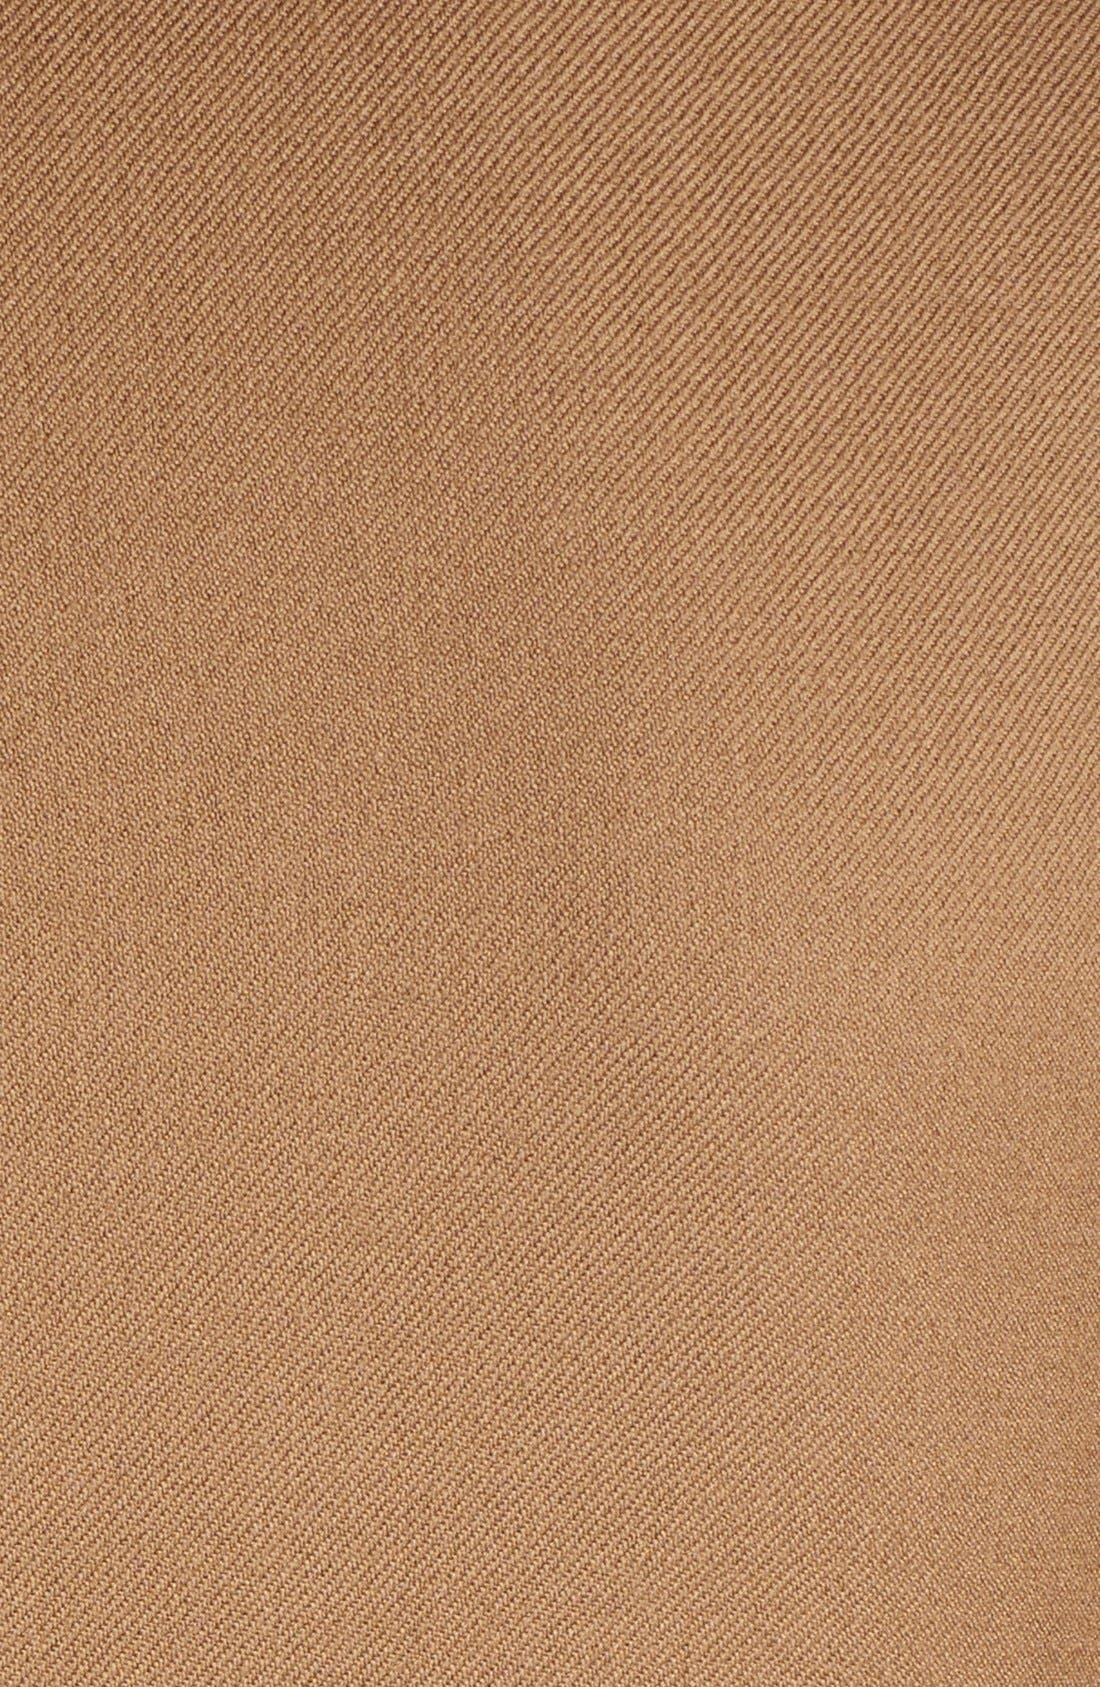 LANVIN, Wool Overcoat, Alternate thumbnail 5, color, 230